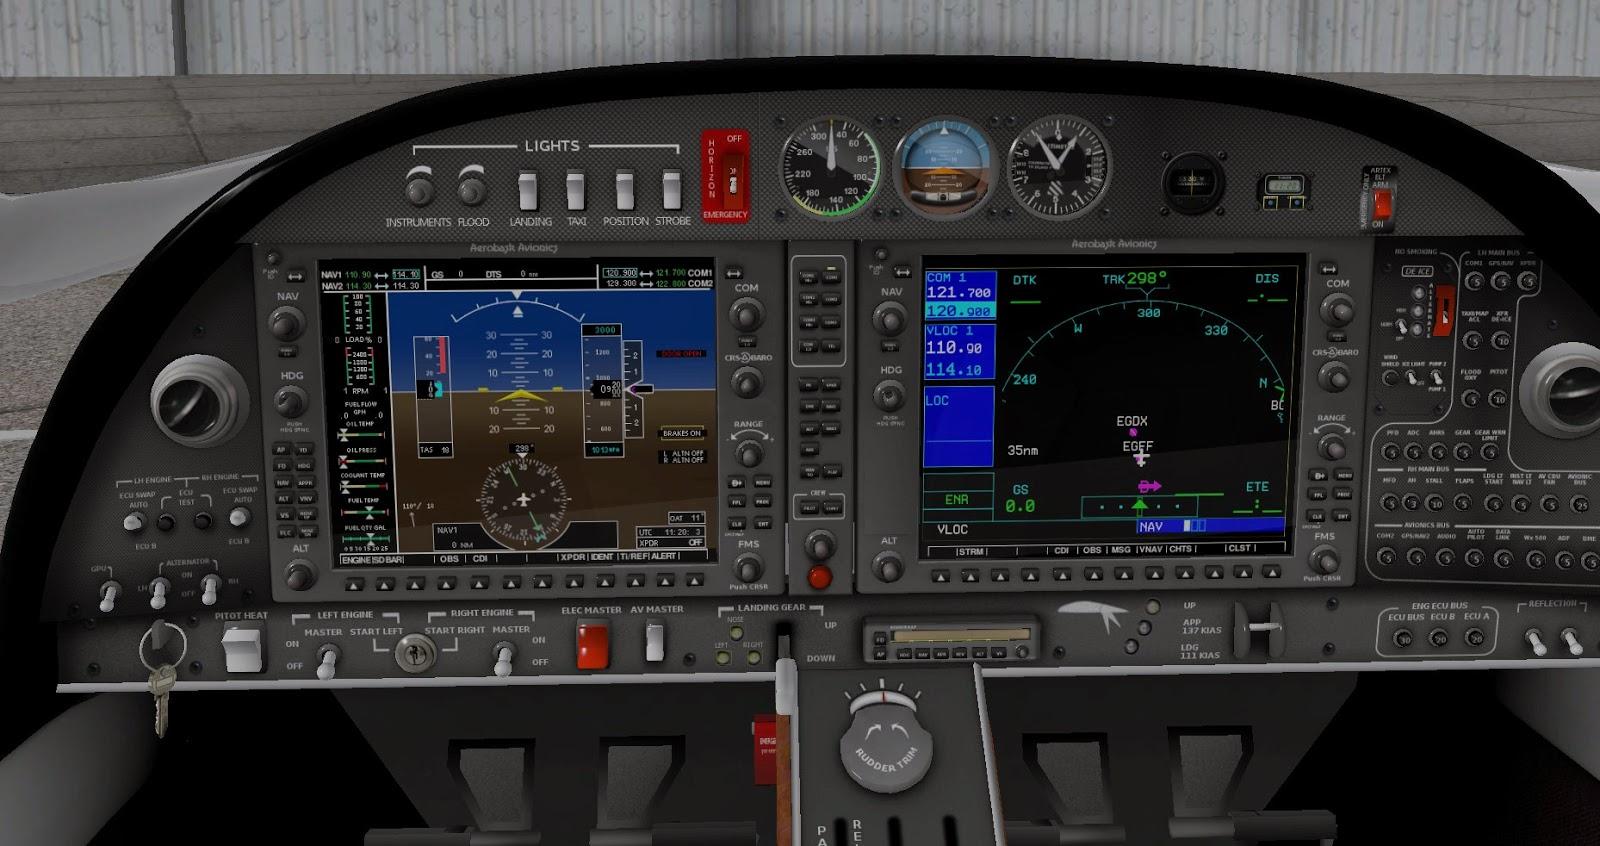 X Plane 11 Keyboard Map